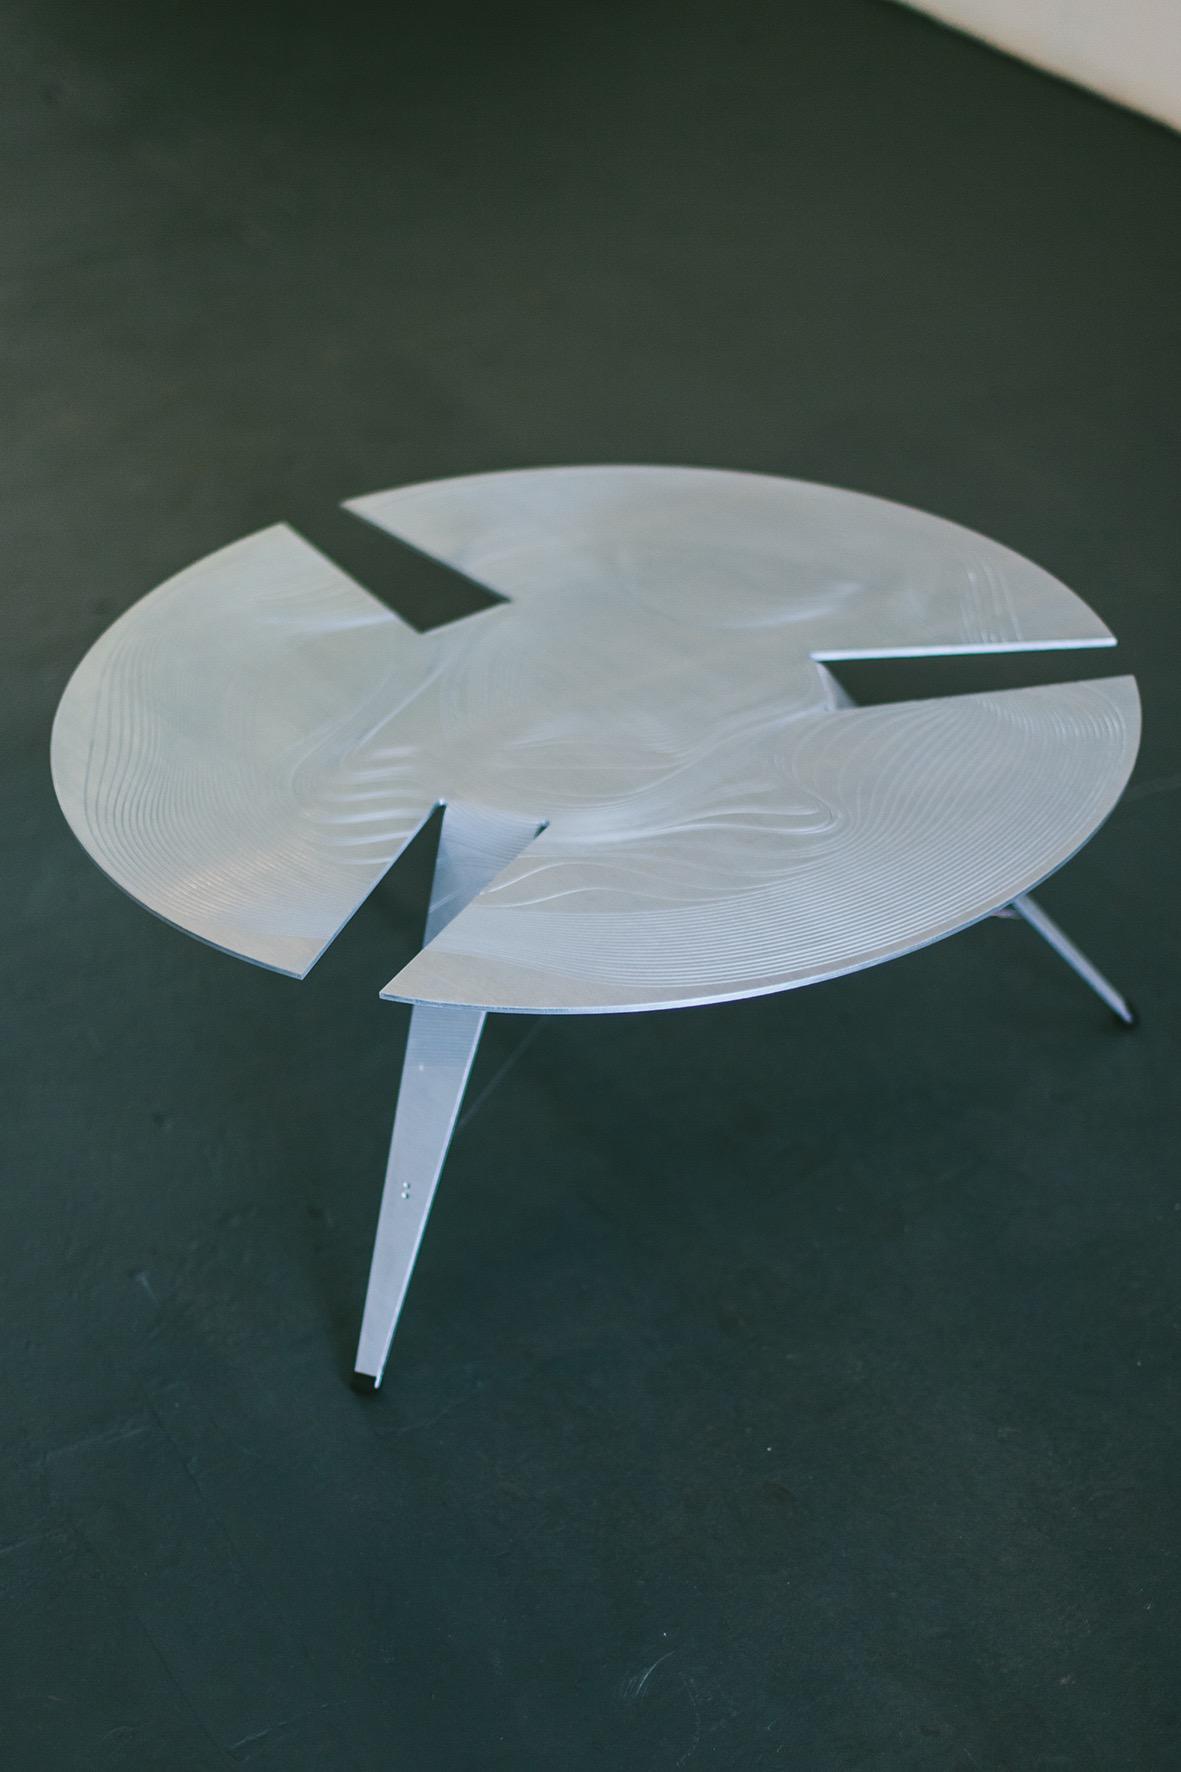 Nolli design - andrea macruz -Boobam 9